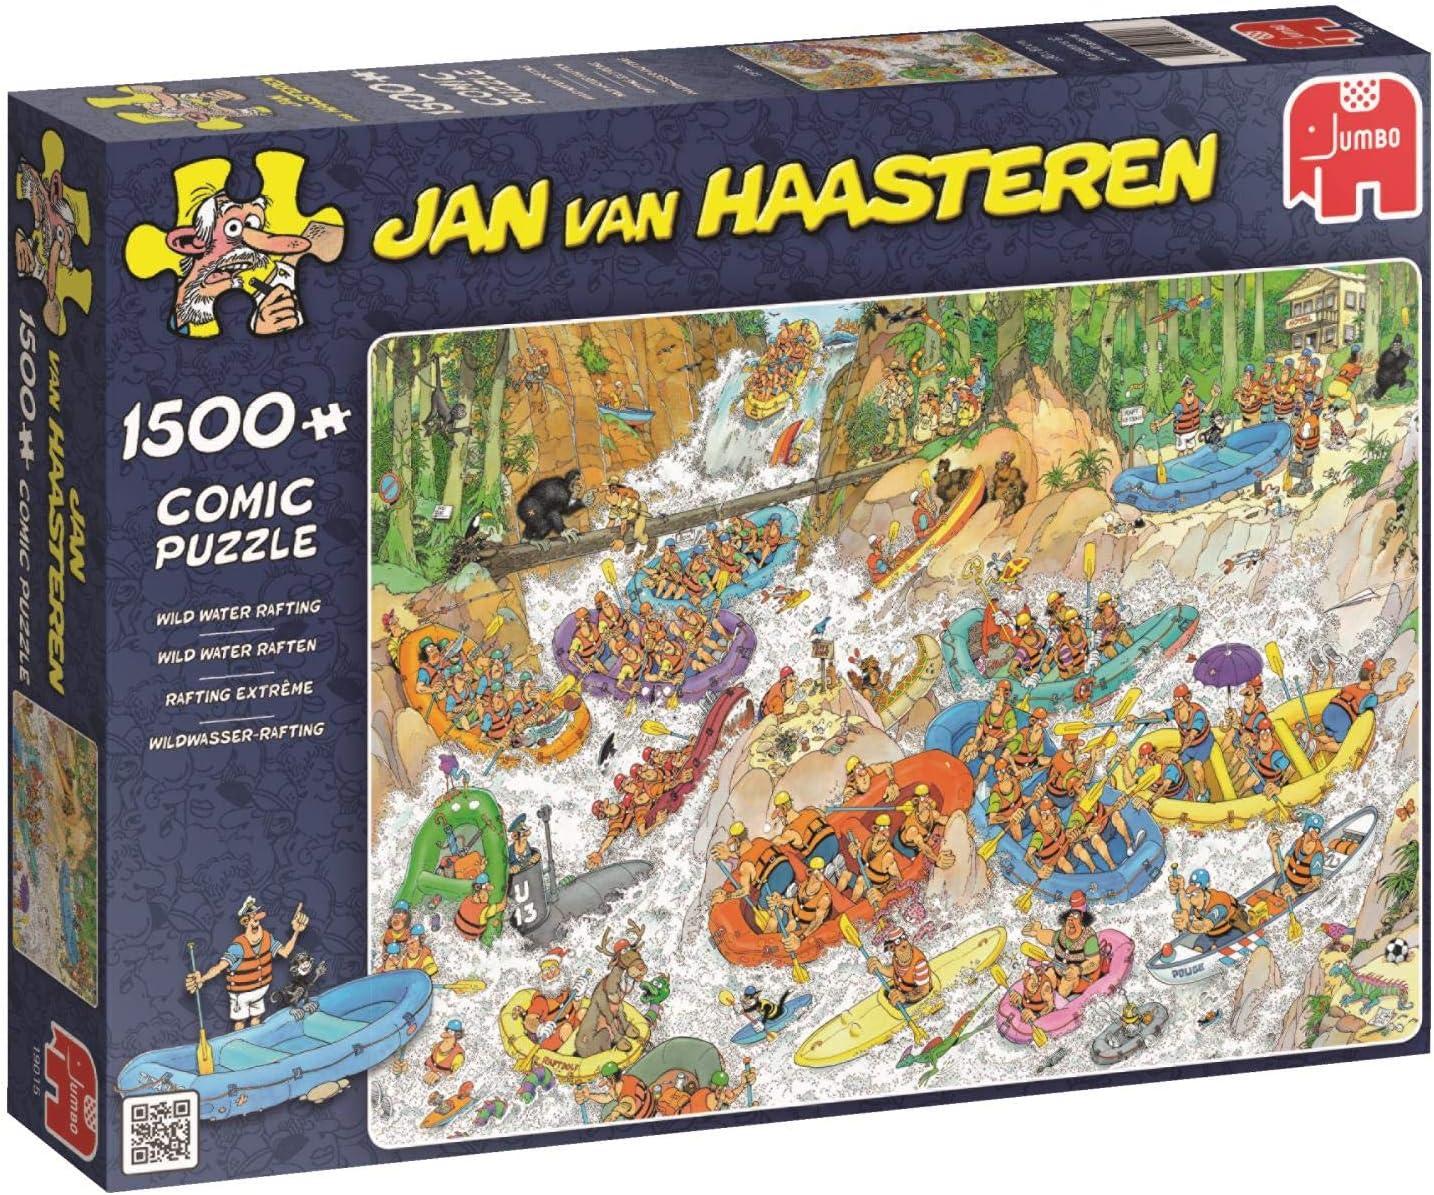 Jumbo Jan Van Haasteren Wild Water Rafting Jigsaw Puzzle (1500 Piece)